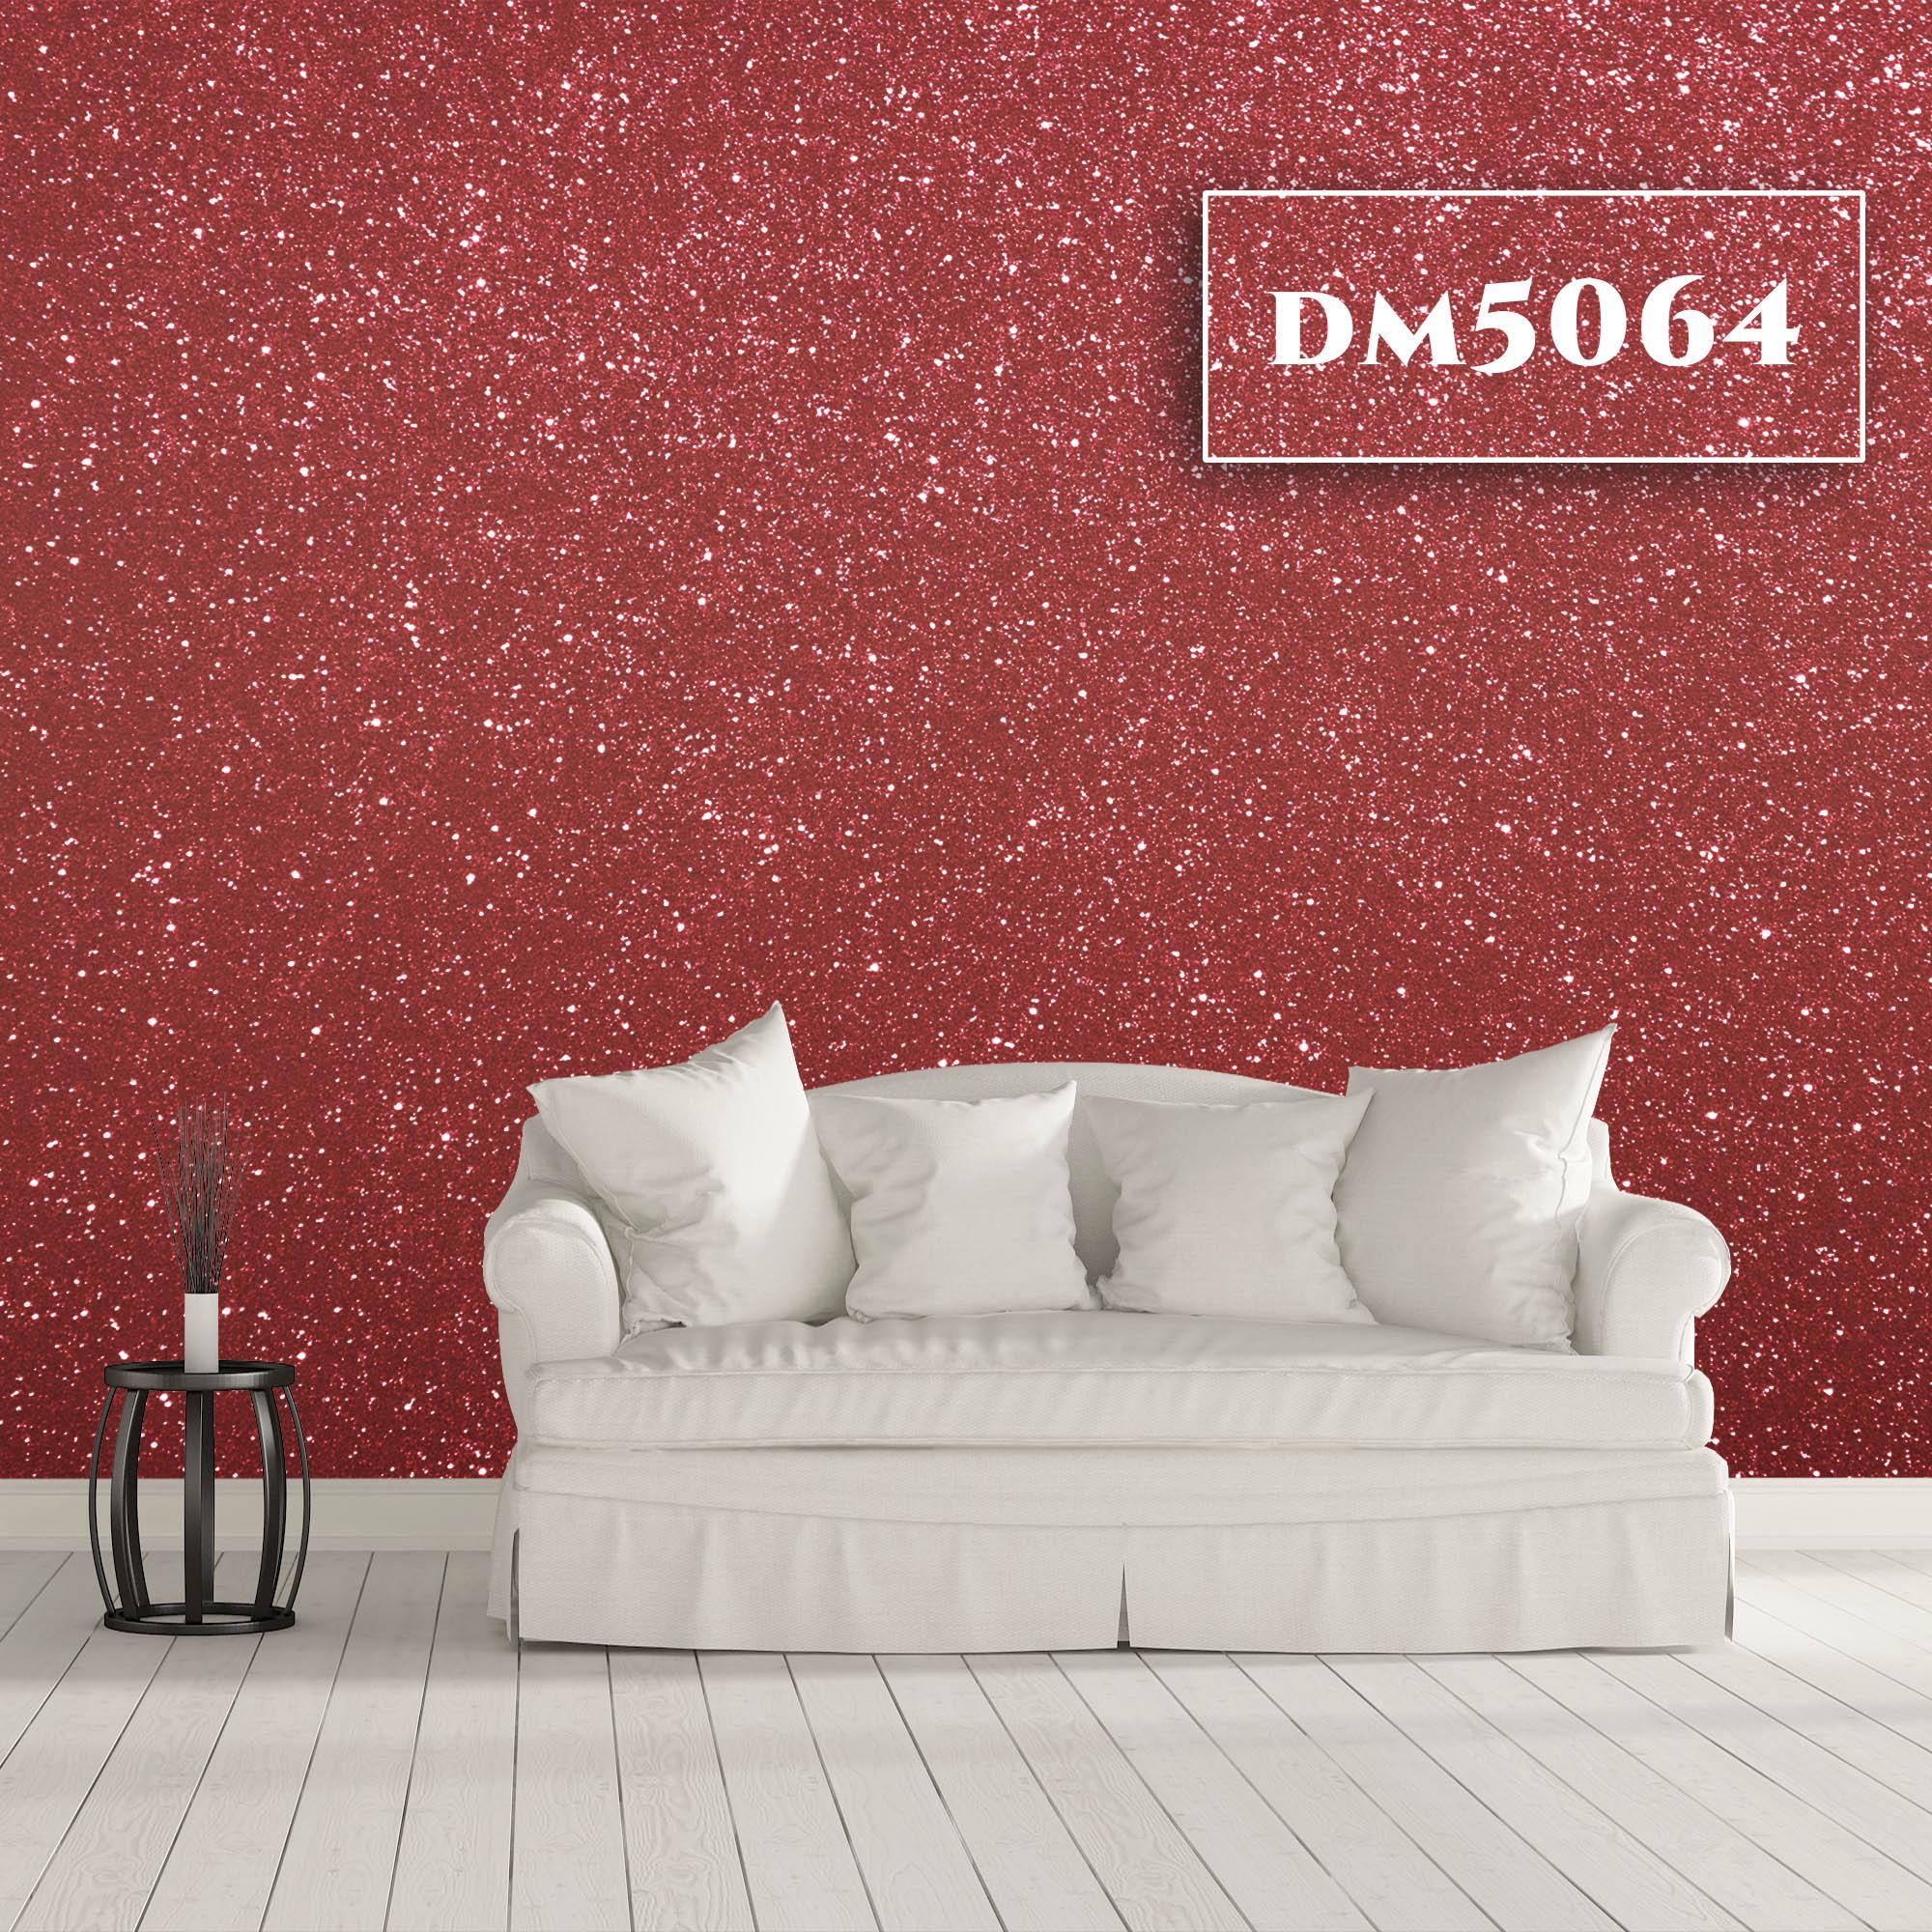 DM5064